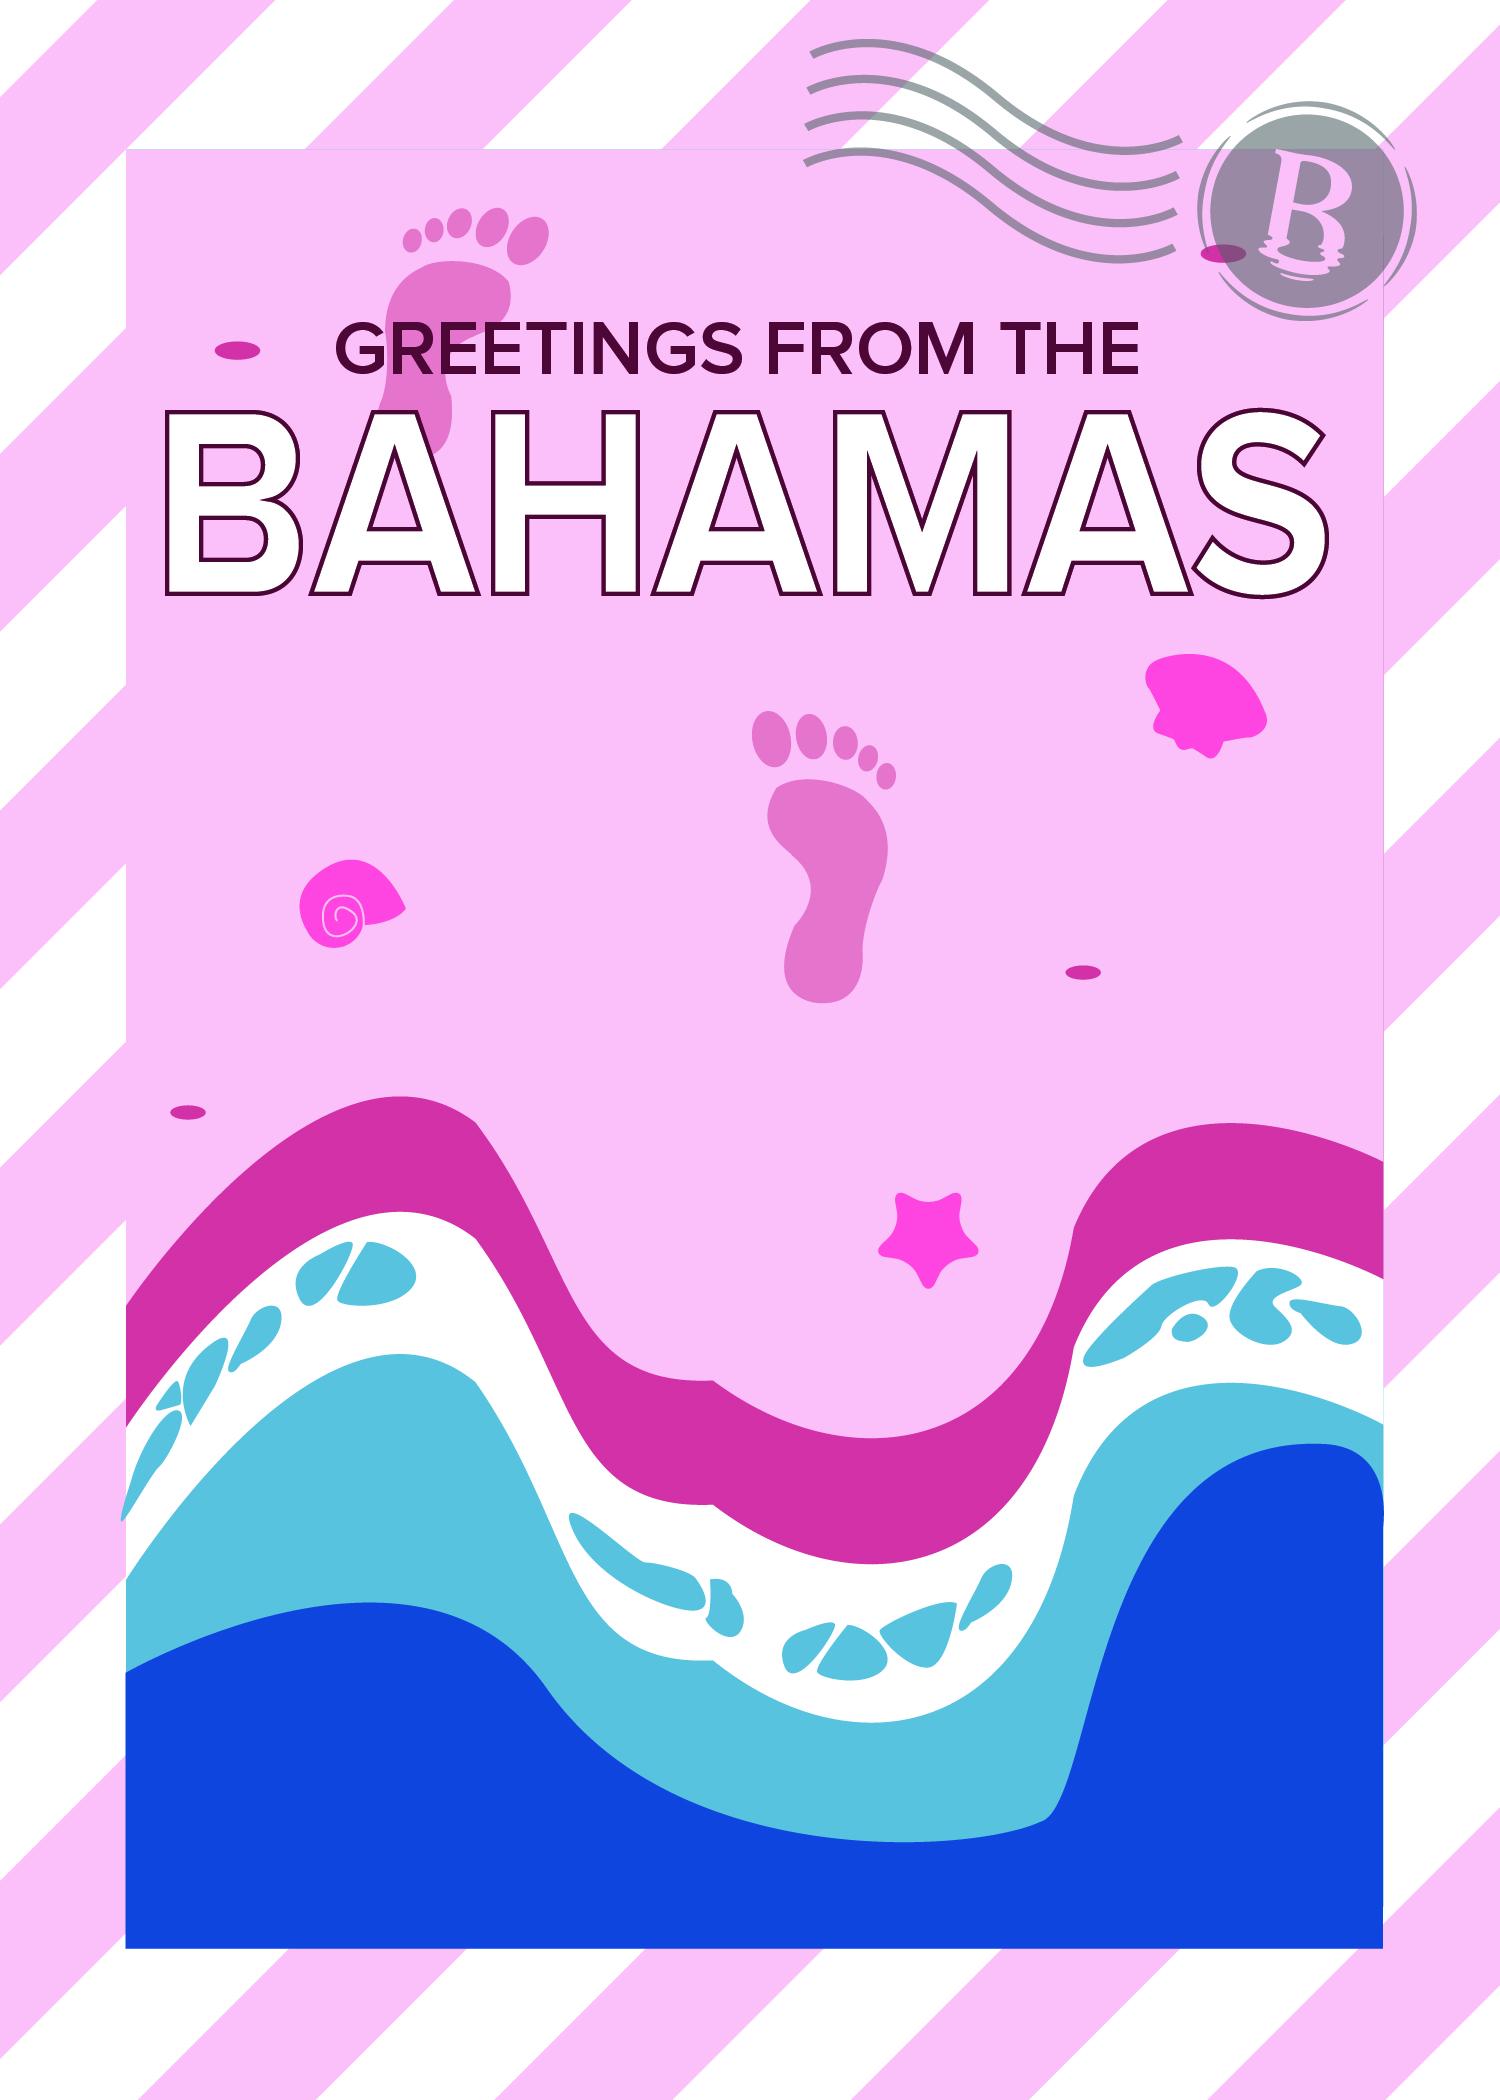 BahamasPostcard